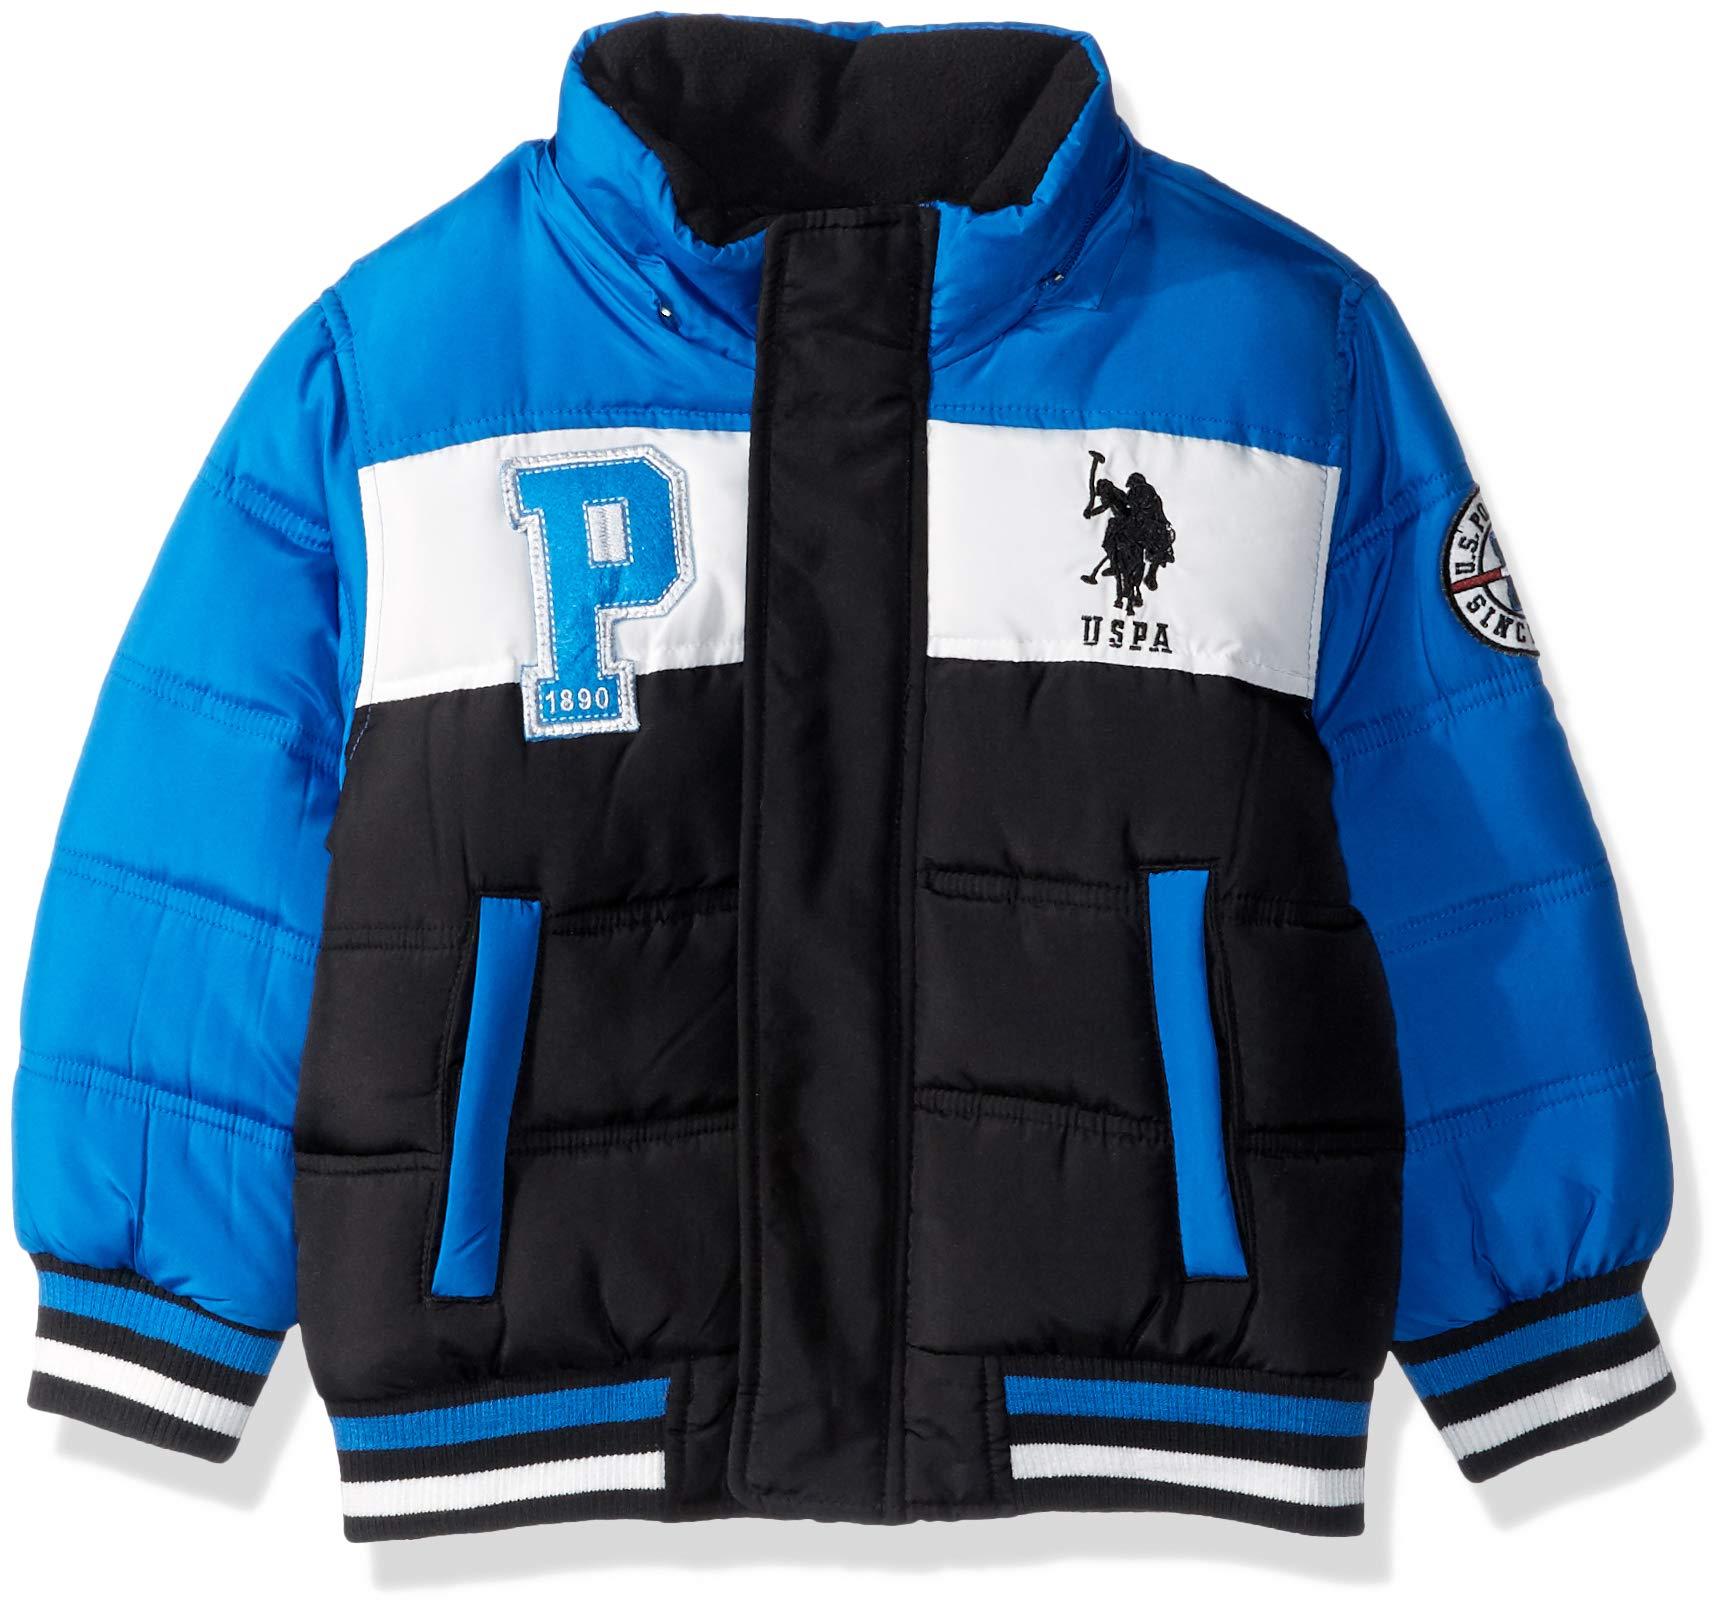 US Polo Association Boys' Big Bubble Jacket with Rib Knit Cuffs, Black/Blue Tile, 8 by U.S. Polo Assn. (Image #3)